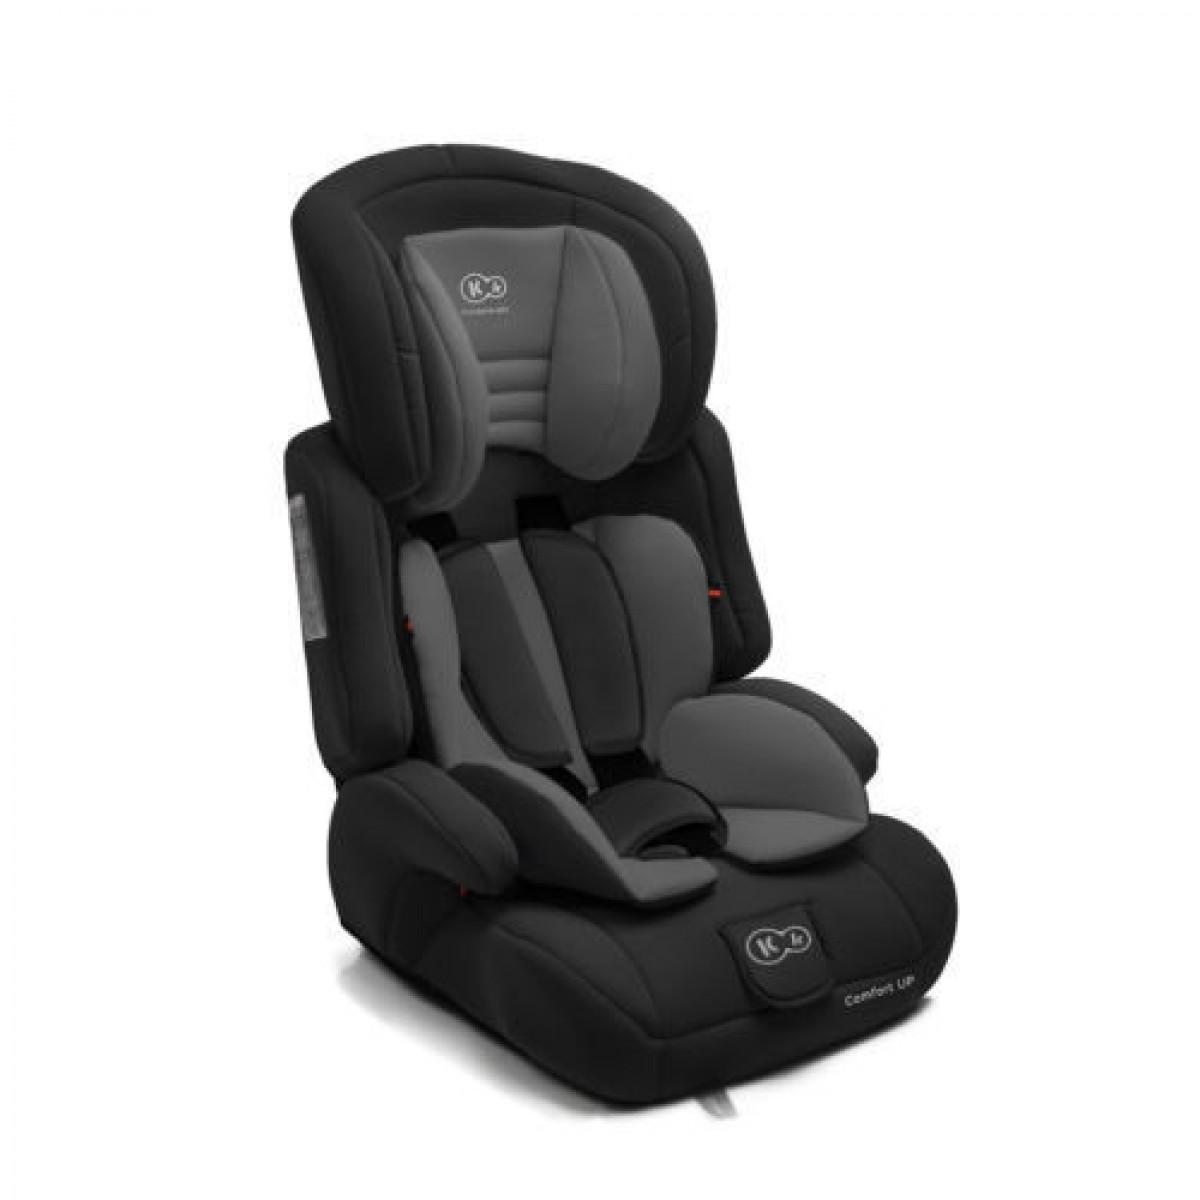 kinderkraft autositz comfort up 9 36 kg. Black Bedroom Furniture Sets. Home Design Ideas